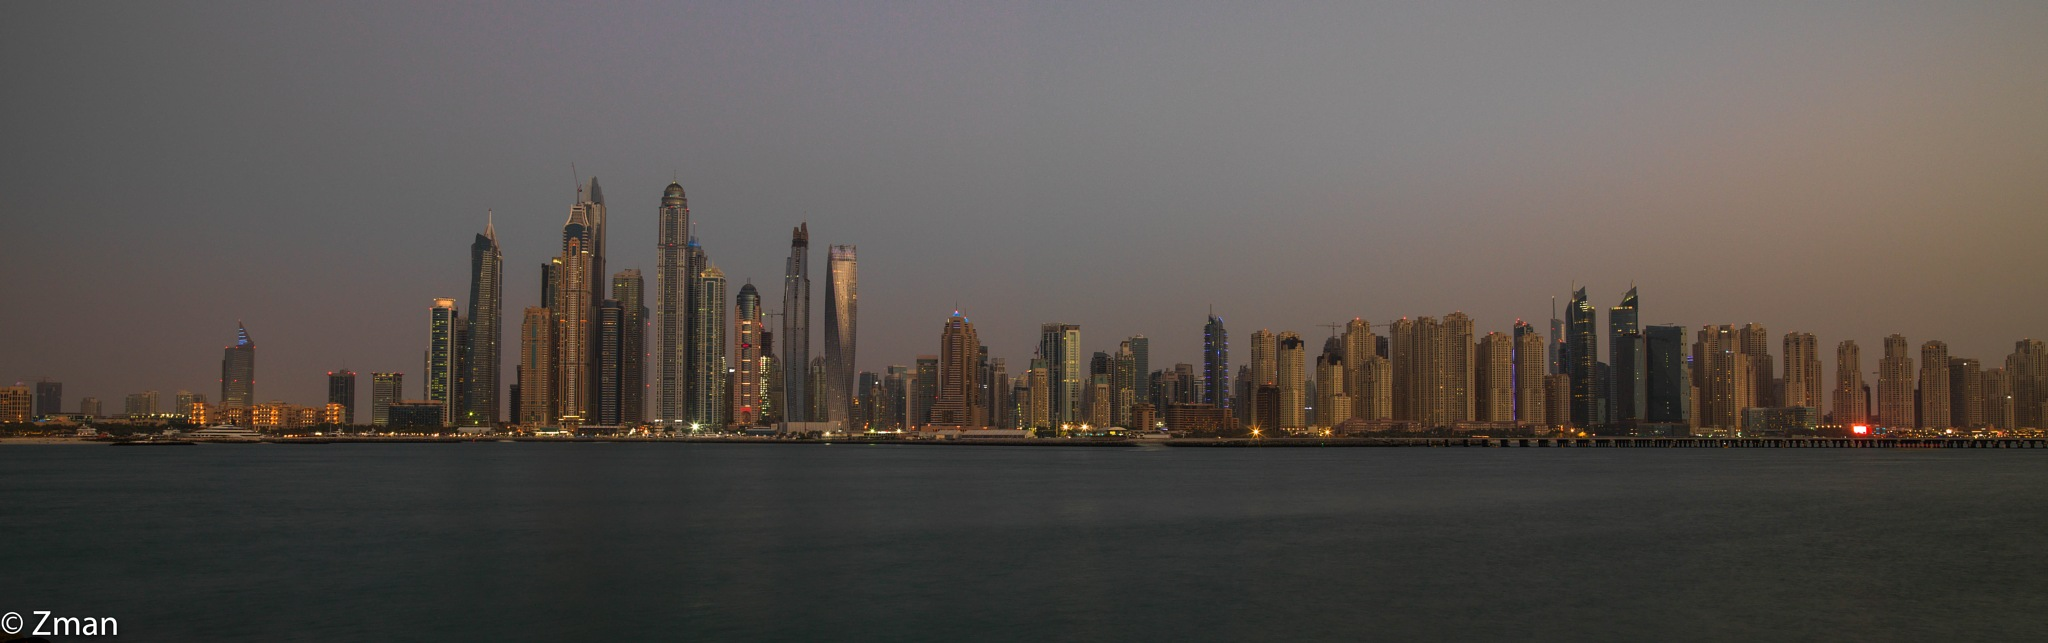 Marina Development by muhammad.nasser.963